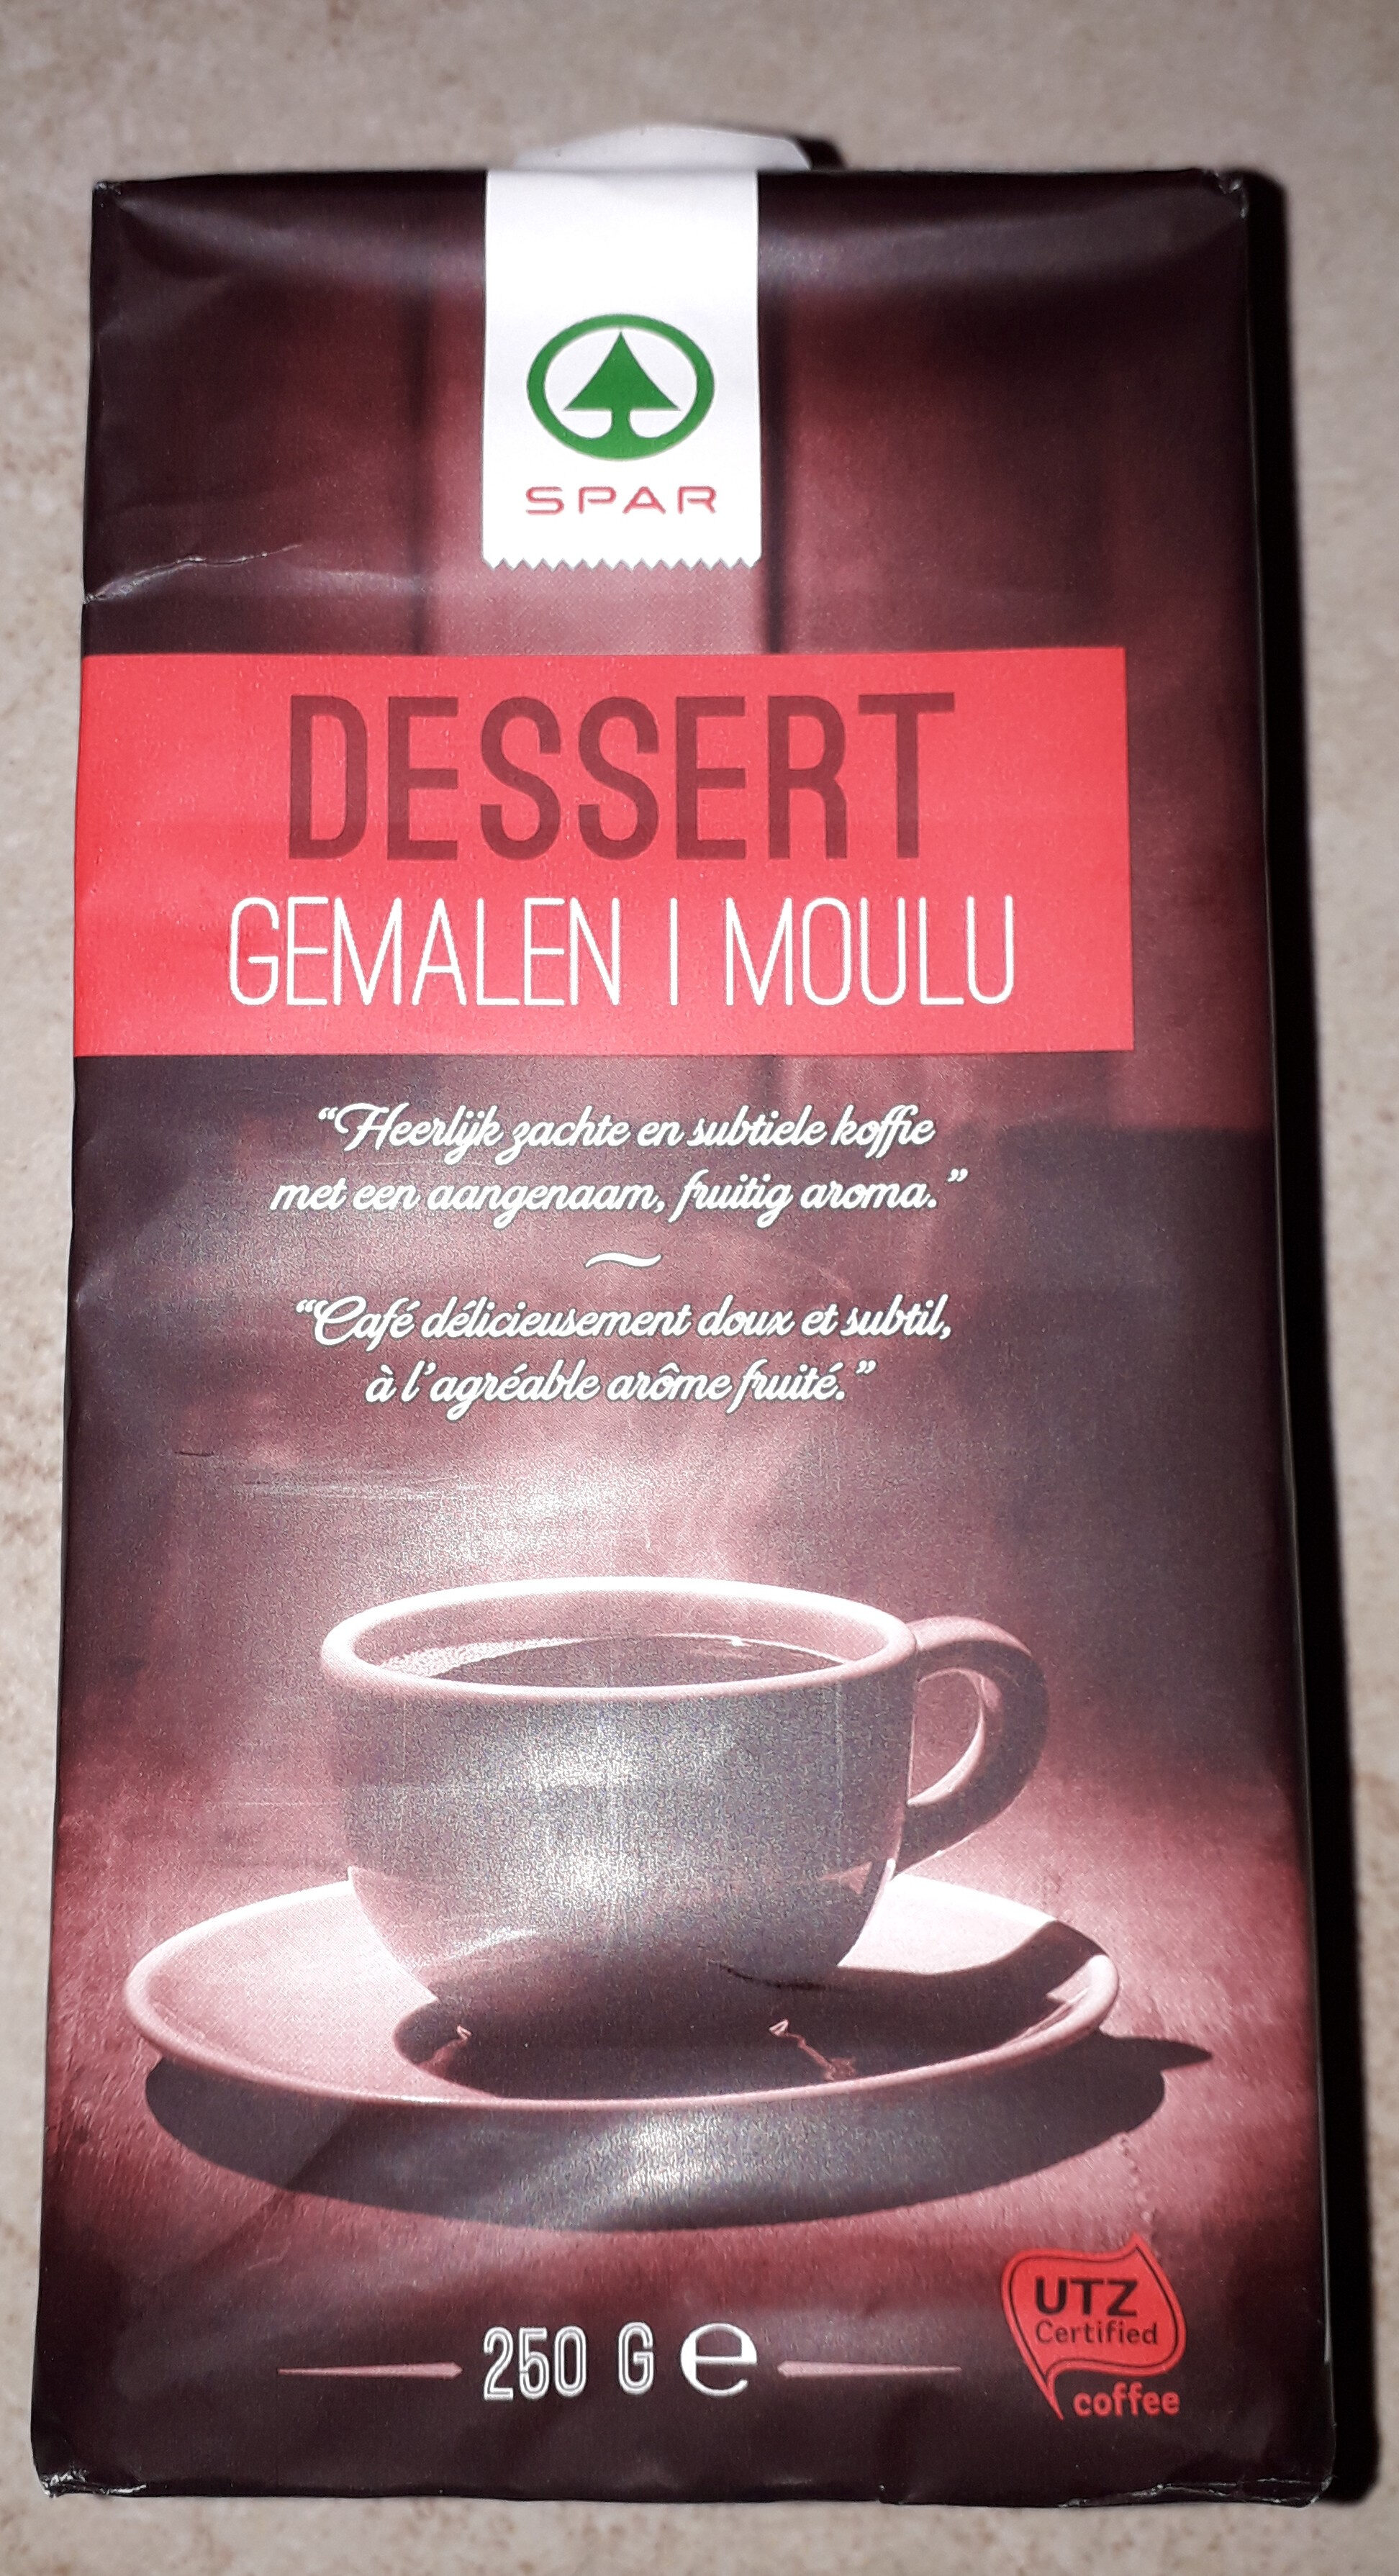 Dessert gemalen i moulu - Product - fr